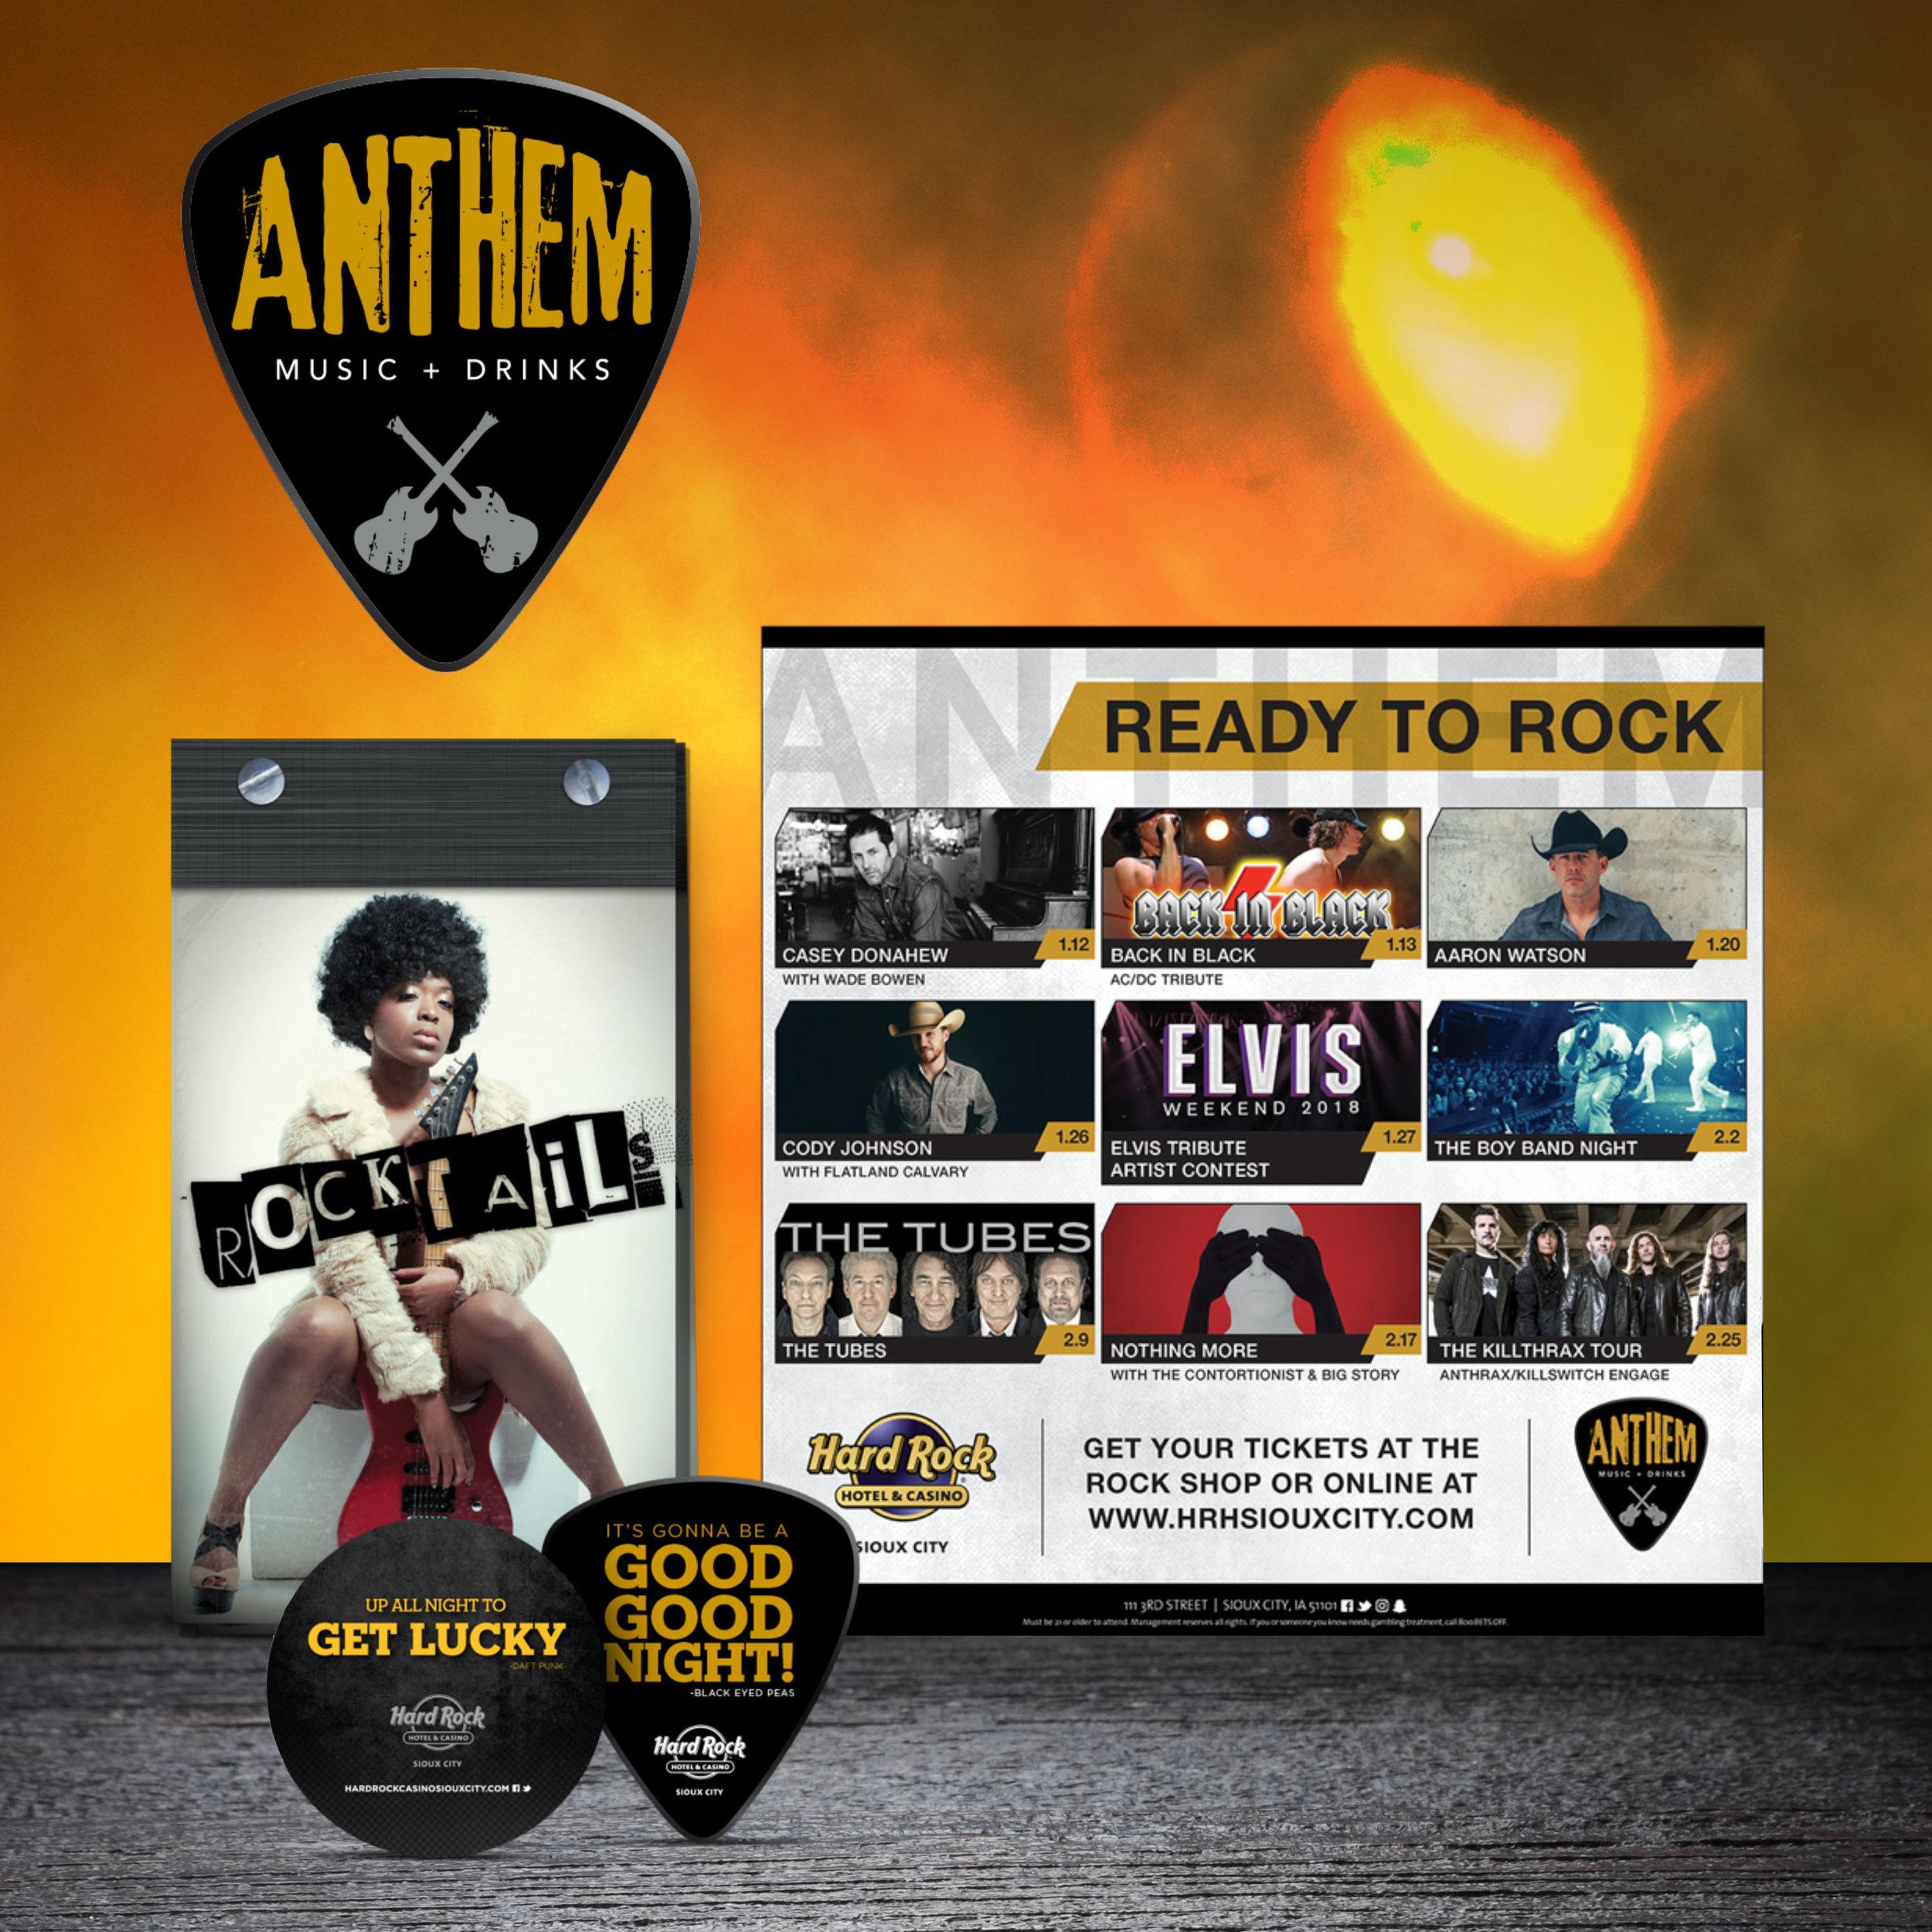 Hard Rock Hotel & Casino Sioux City: Anthem Branding